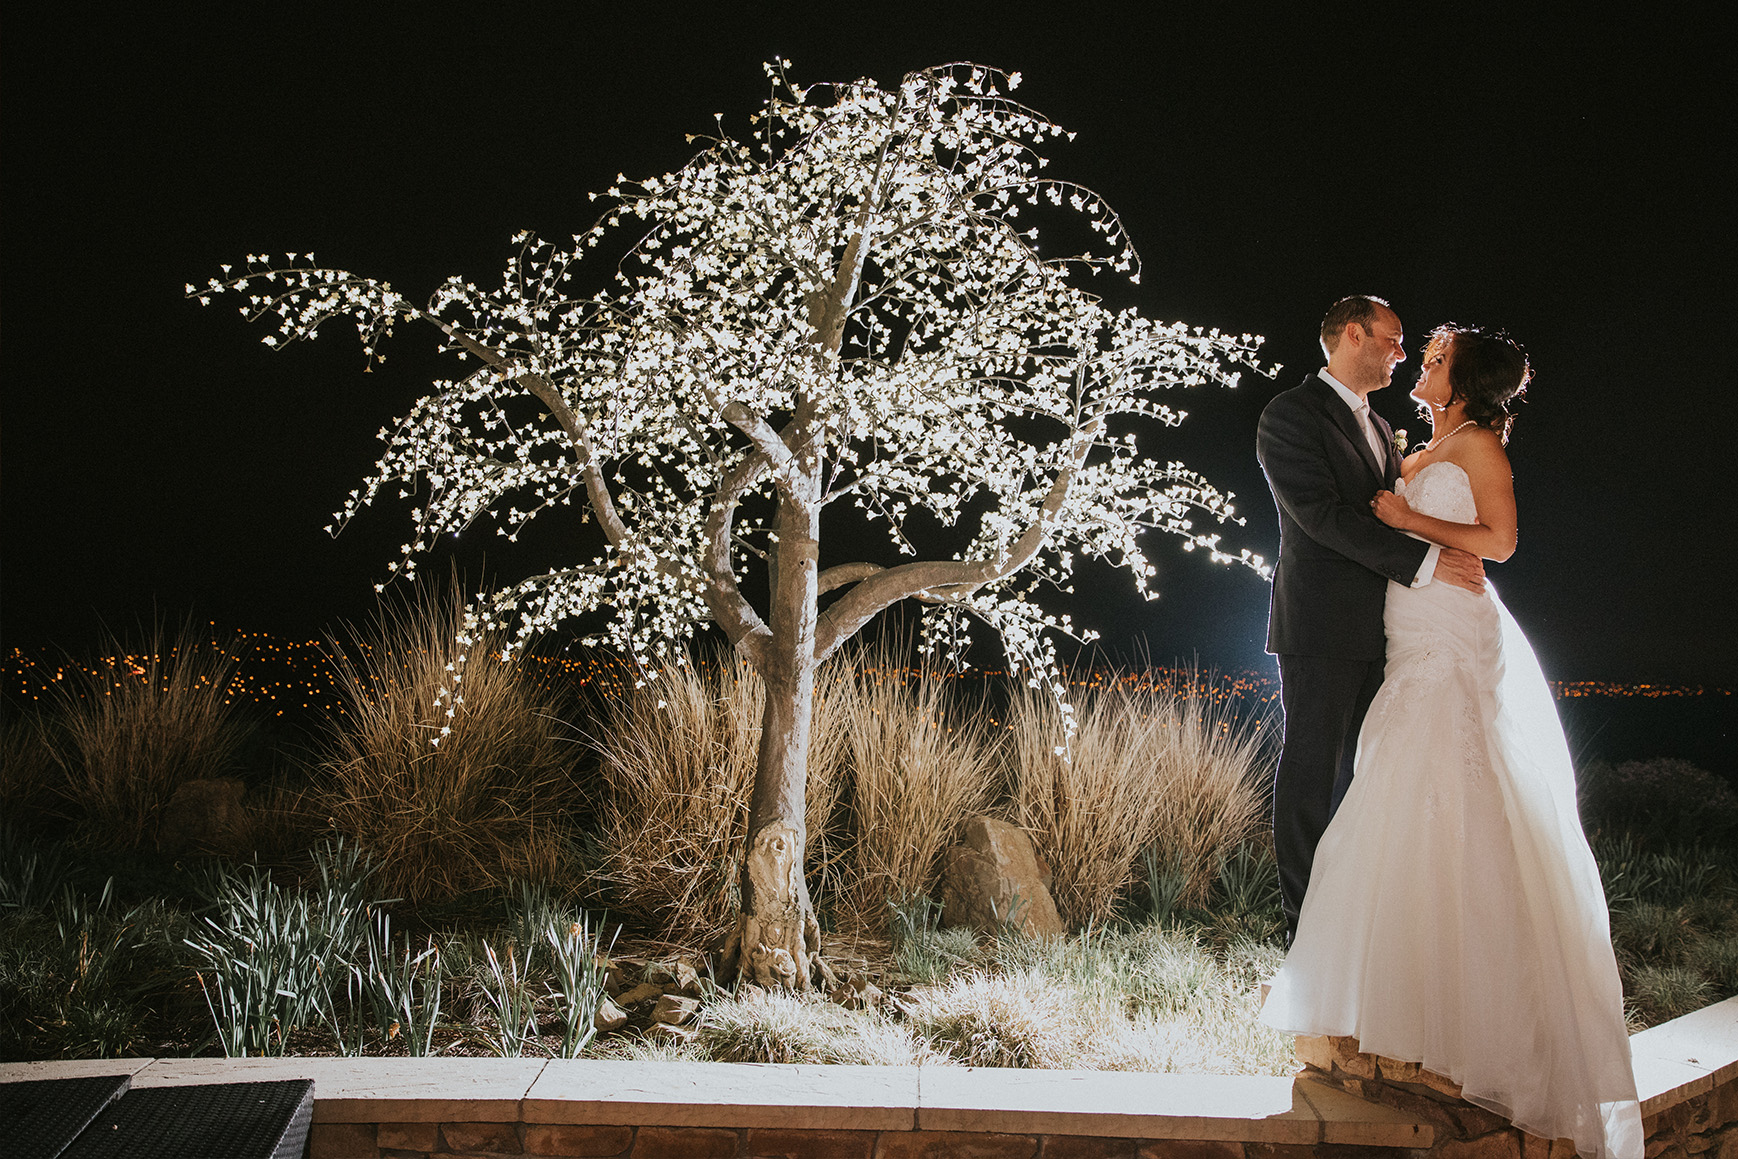 Romantic couple - Boulder Ridge - Los Gatos, California - San Jose, California - Santa Clara County - Wedgewood Weddings